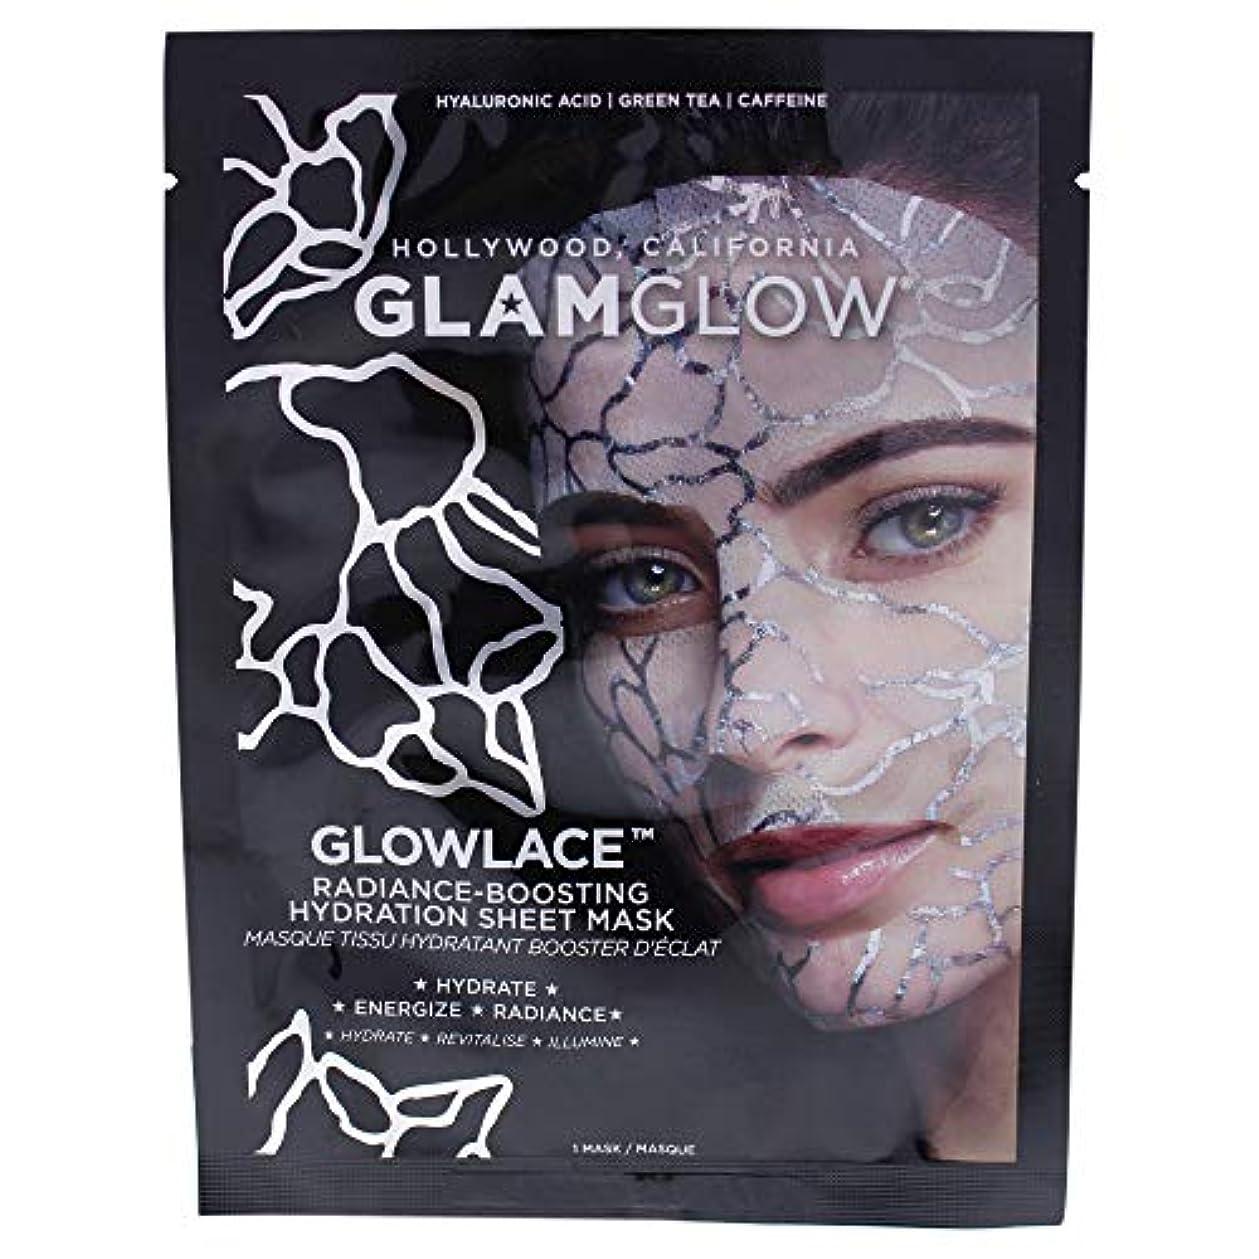 土地項目神社Glowlace Radiance-Boosting Hydration Sheet Mask